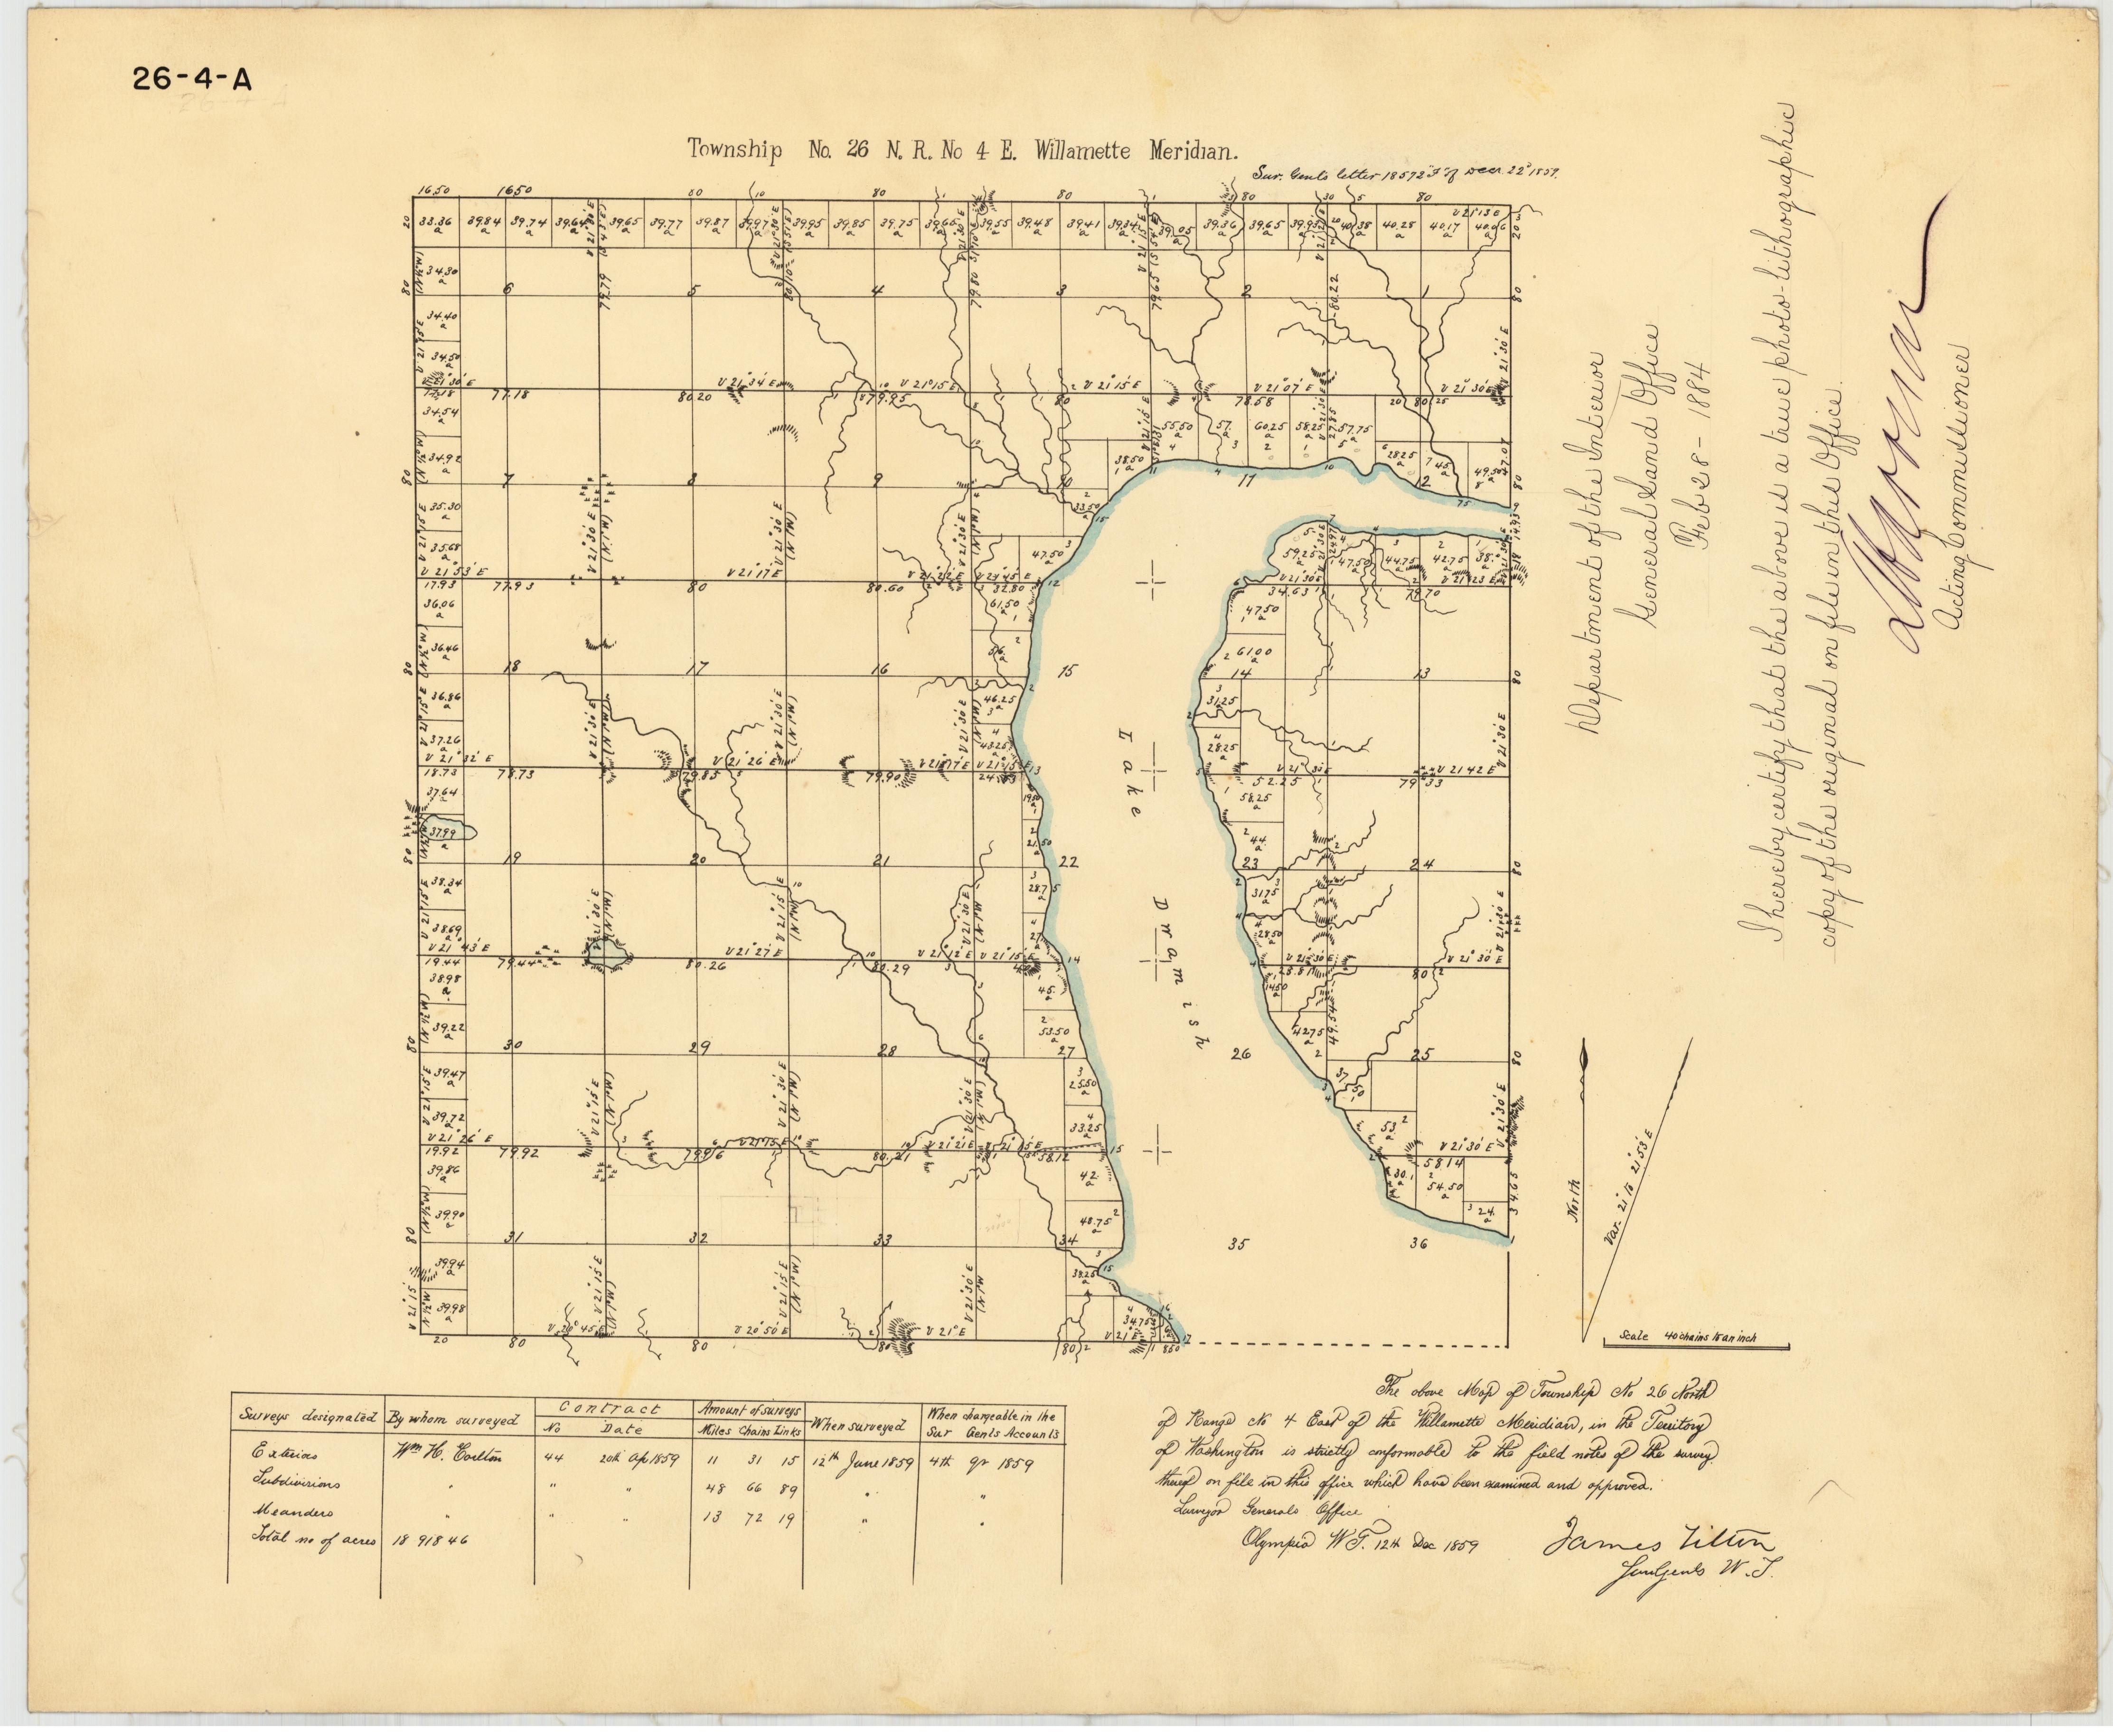 Wedgwoods NE 85th Street Dividing Line Wedgwood in Seattle History